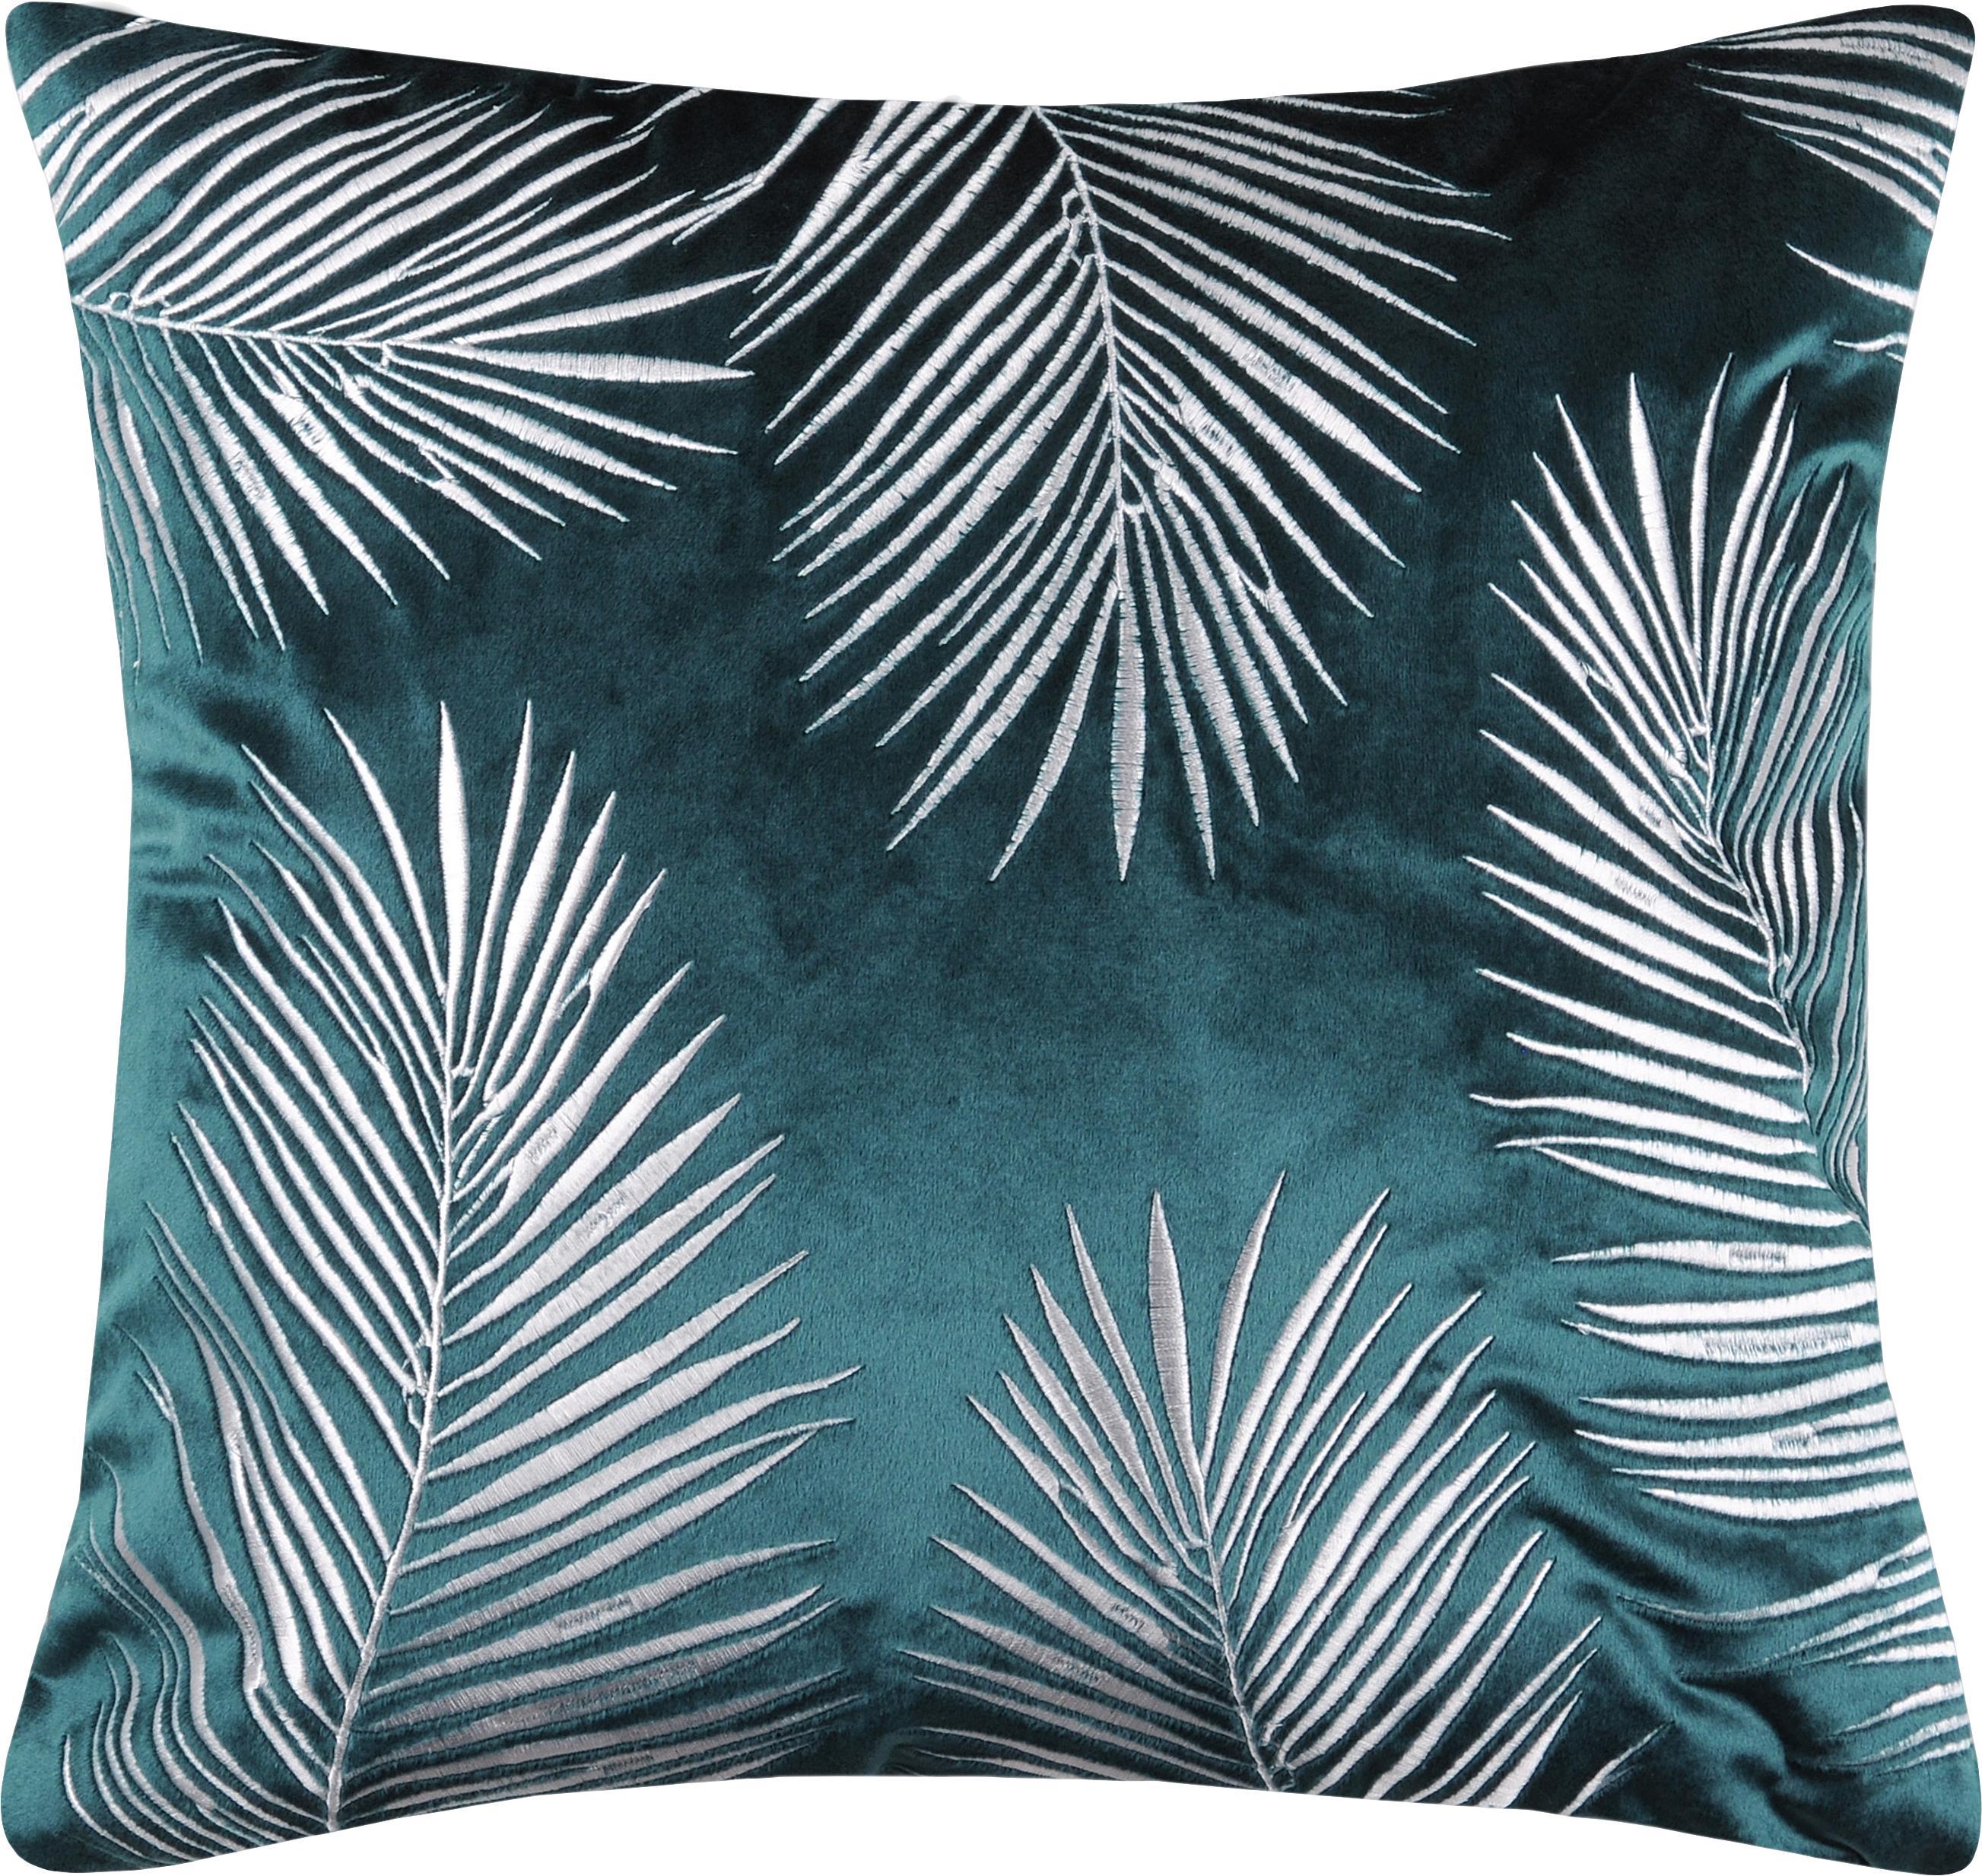 Samt-Kissenhülle Ibarra mit Palmenblatt Stickerei, 100% Polyester, Petrolblau, Weiss, 45 x 45 cm